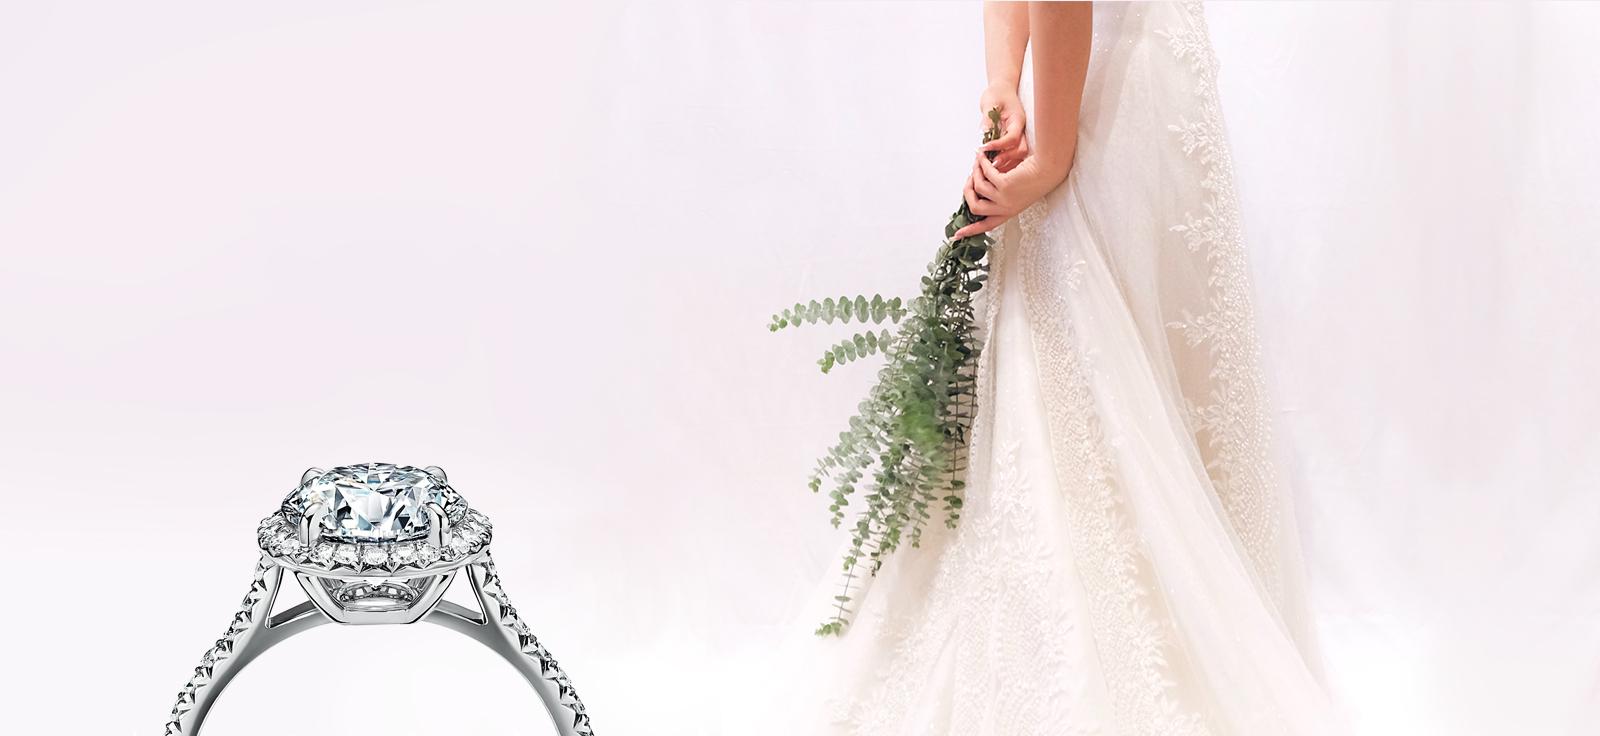 Alexandridi-Engagement_Rings_Summer21